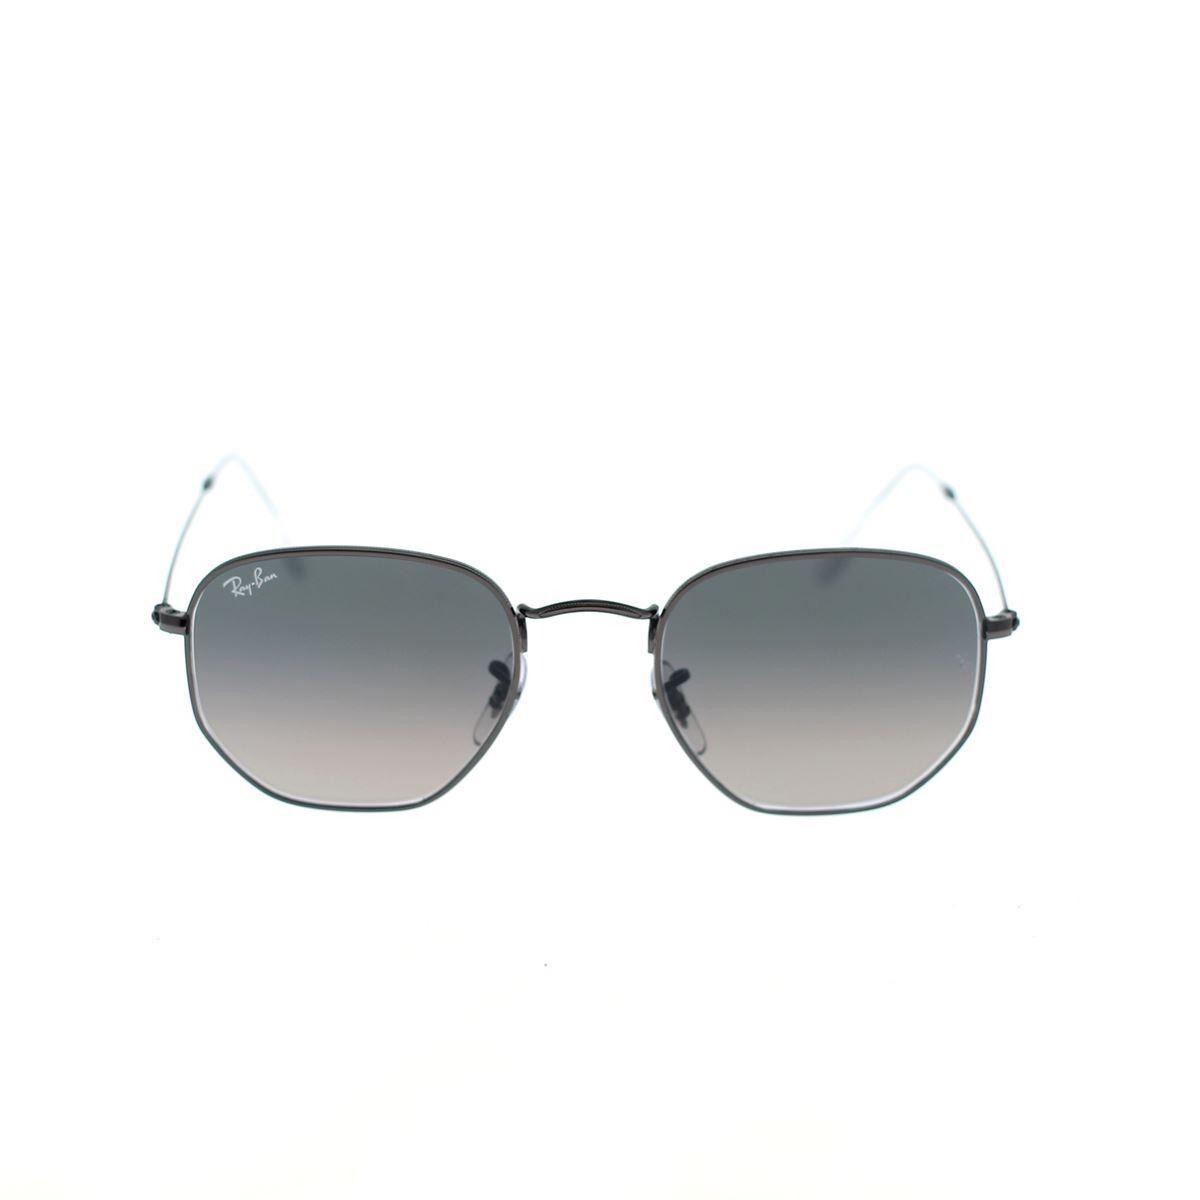 ray-ban occhiali da sole hexagonal rb3548n 004/71